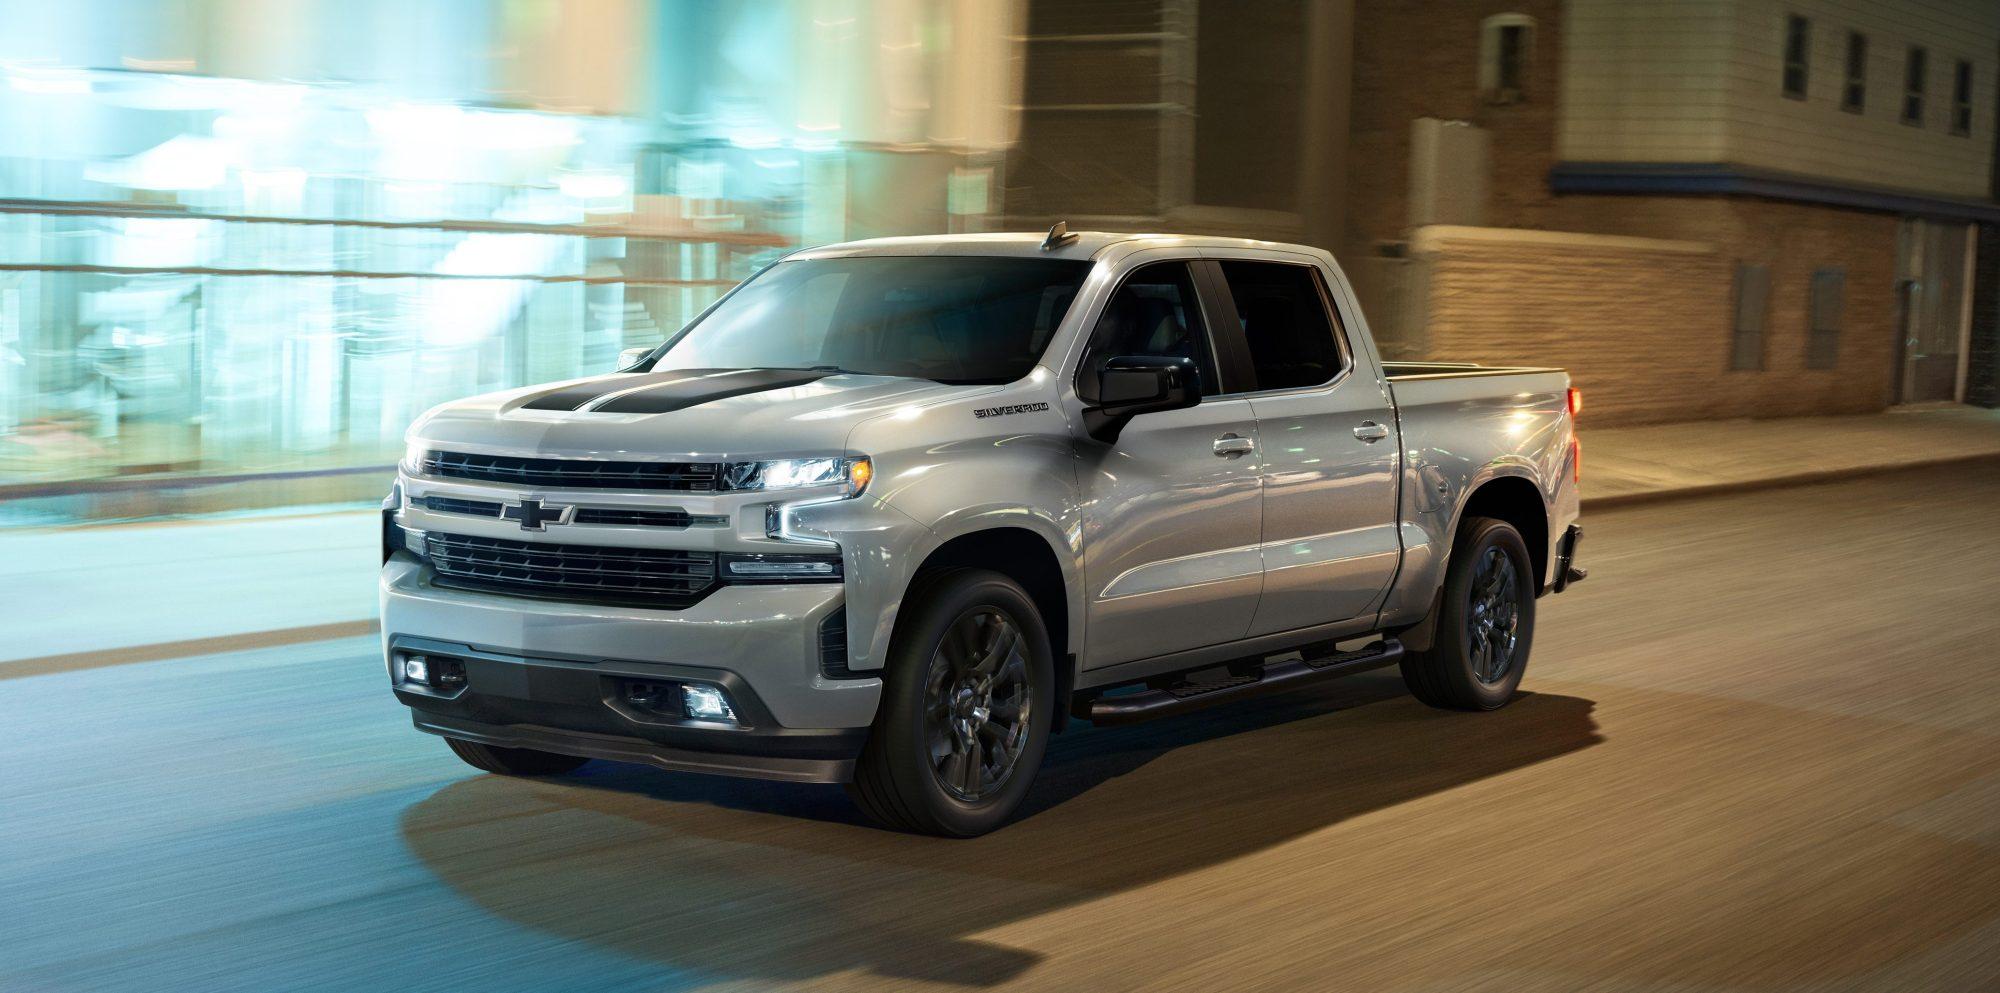 2020-Chevrolet-Silverado-Rally-Edition-110-1-e1595097836760.jpg